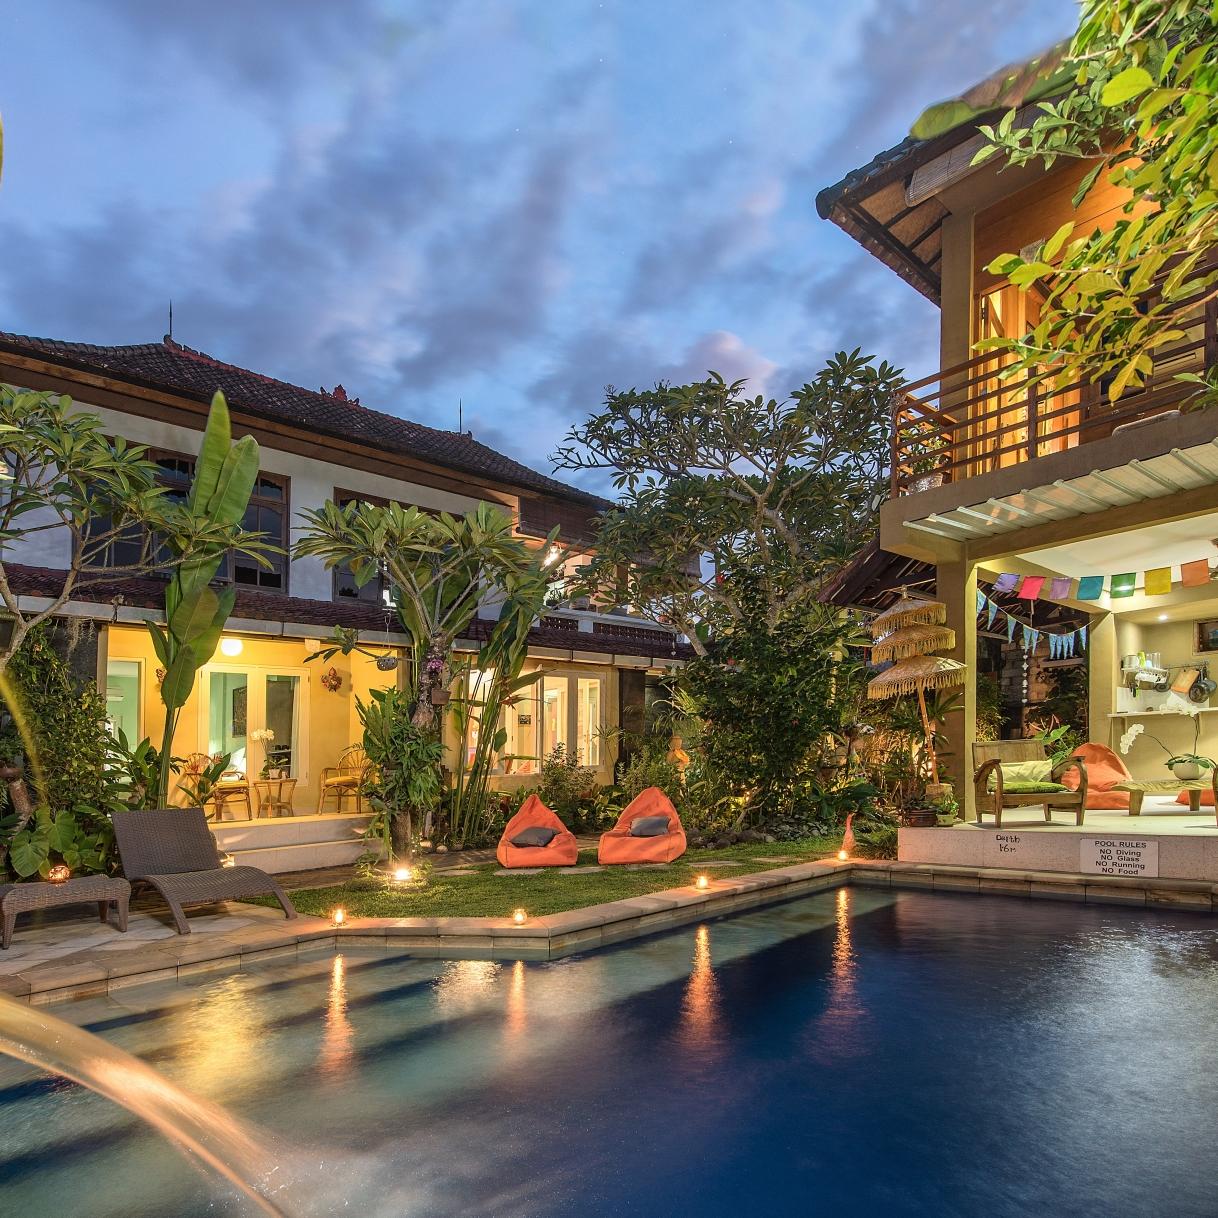 Angel House Ubud. Peaceful tropical oasis in the village of MasUbud.